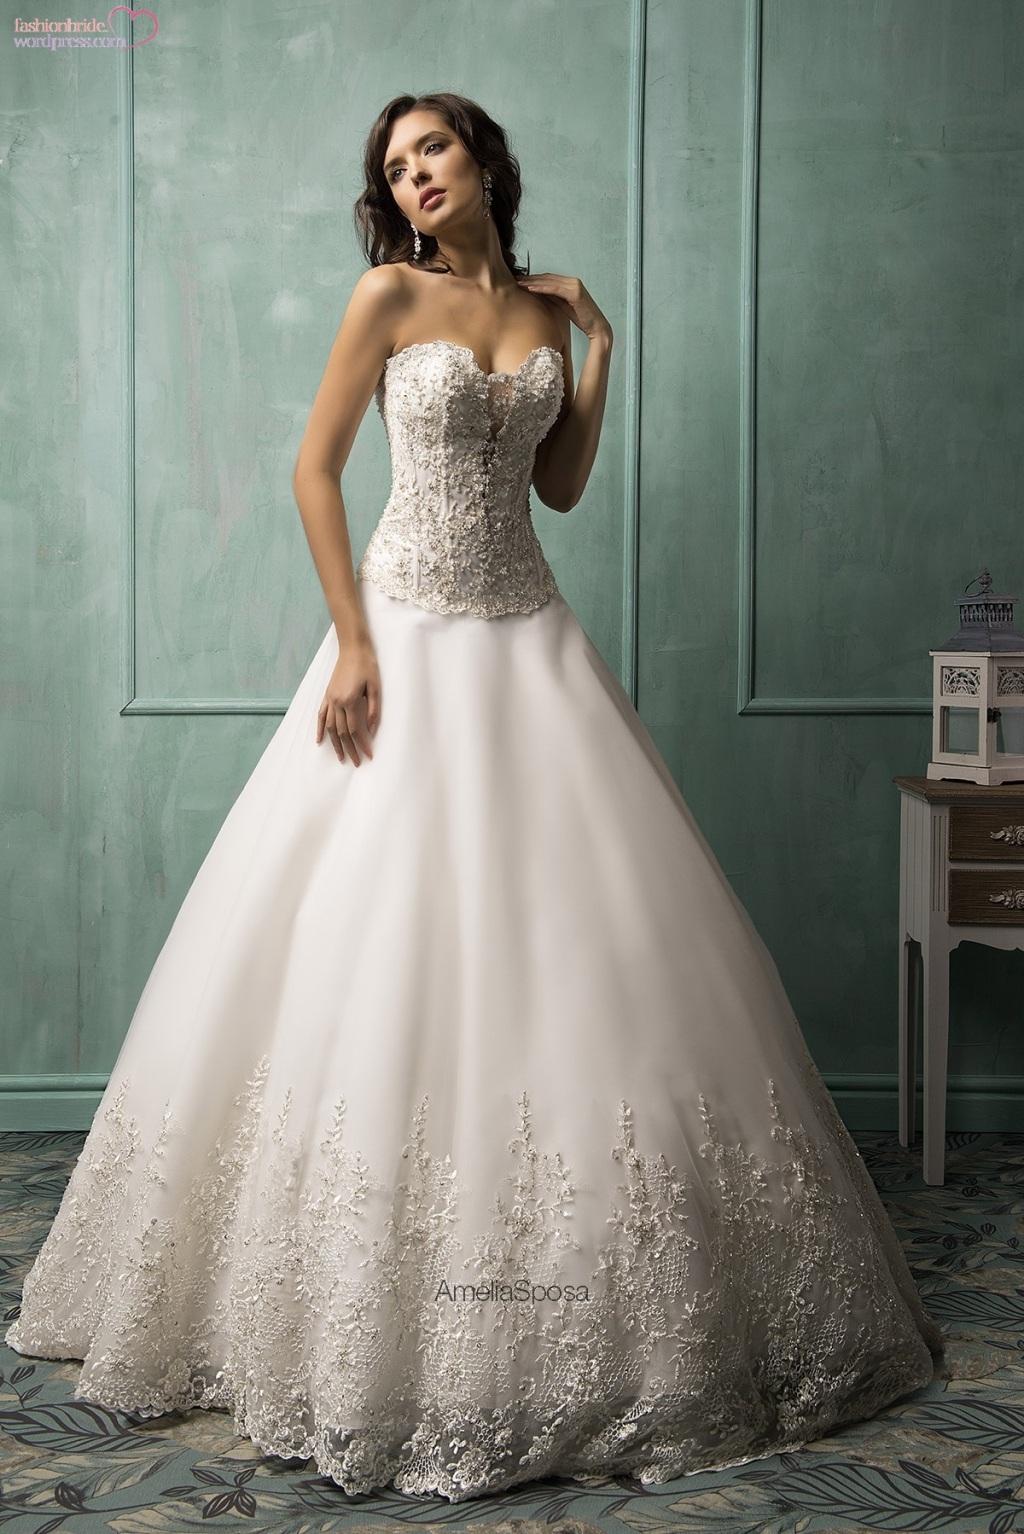 Amelia Sposa Spring 2014 Bridal Collection III